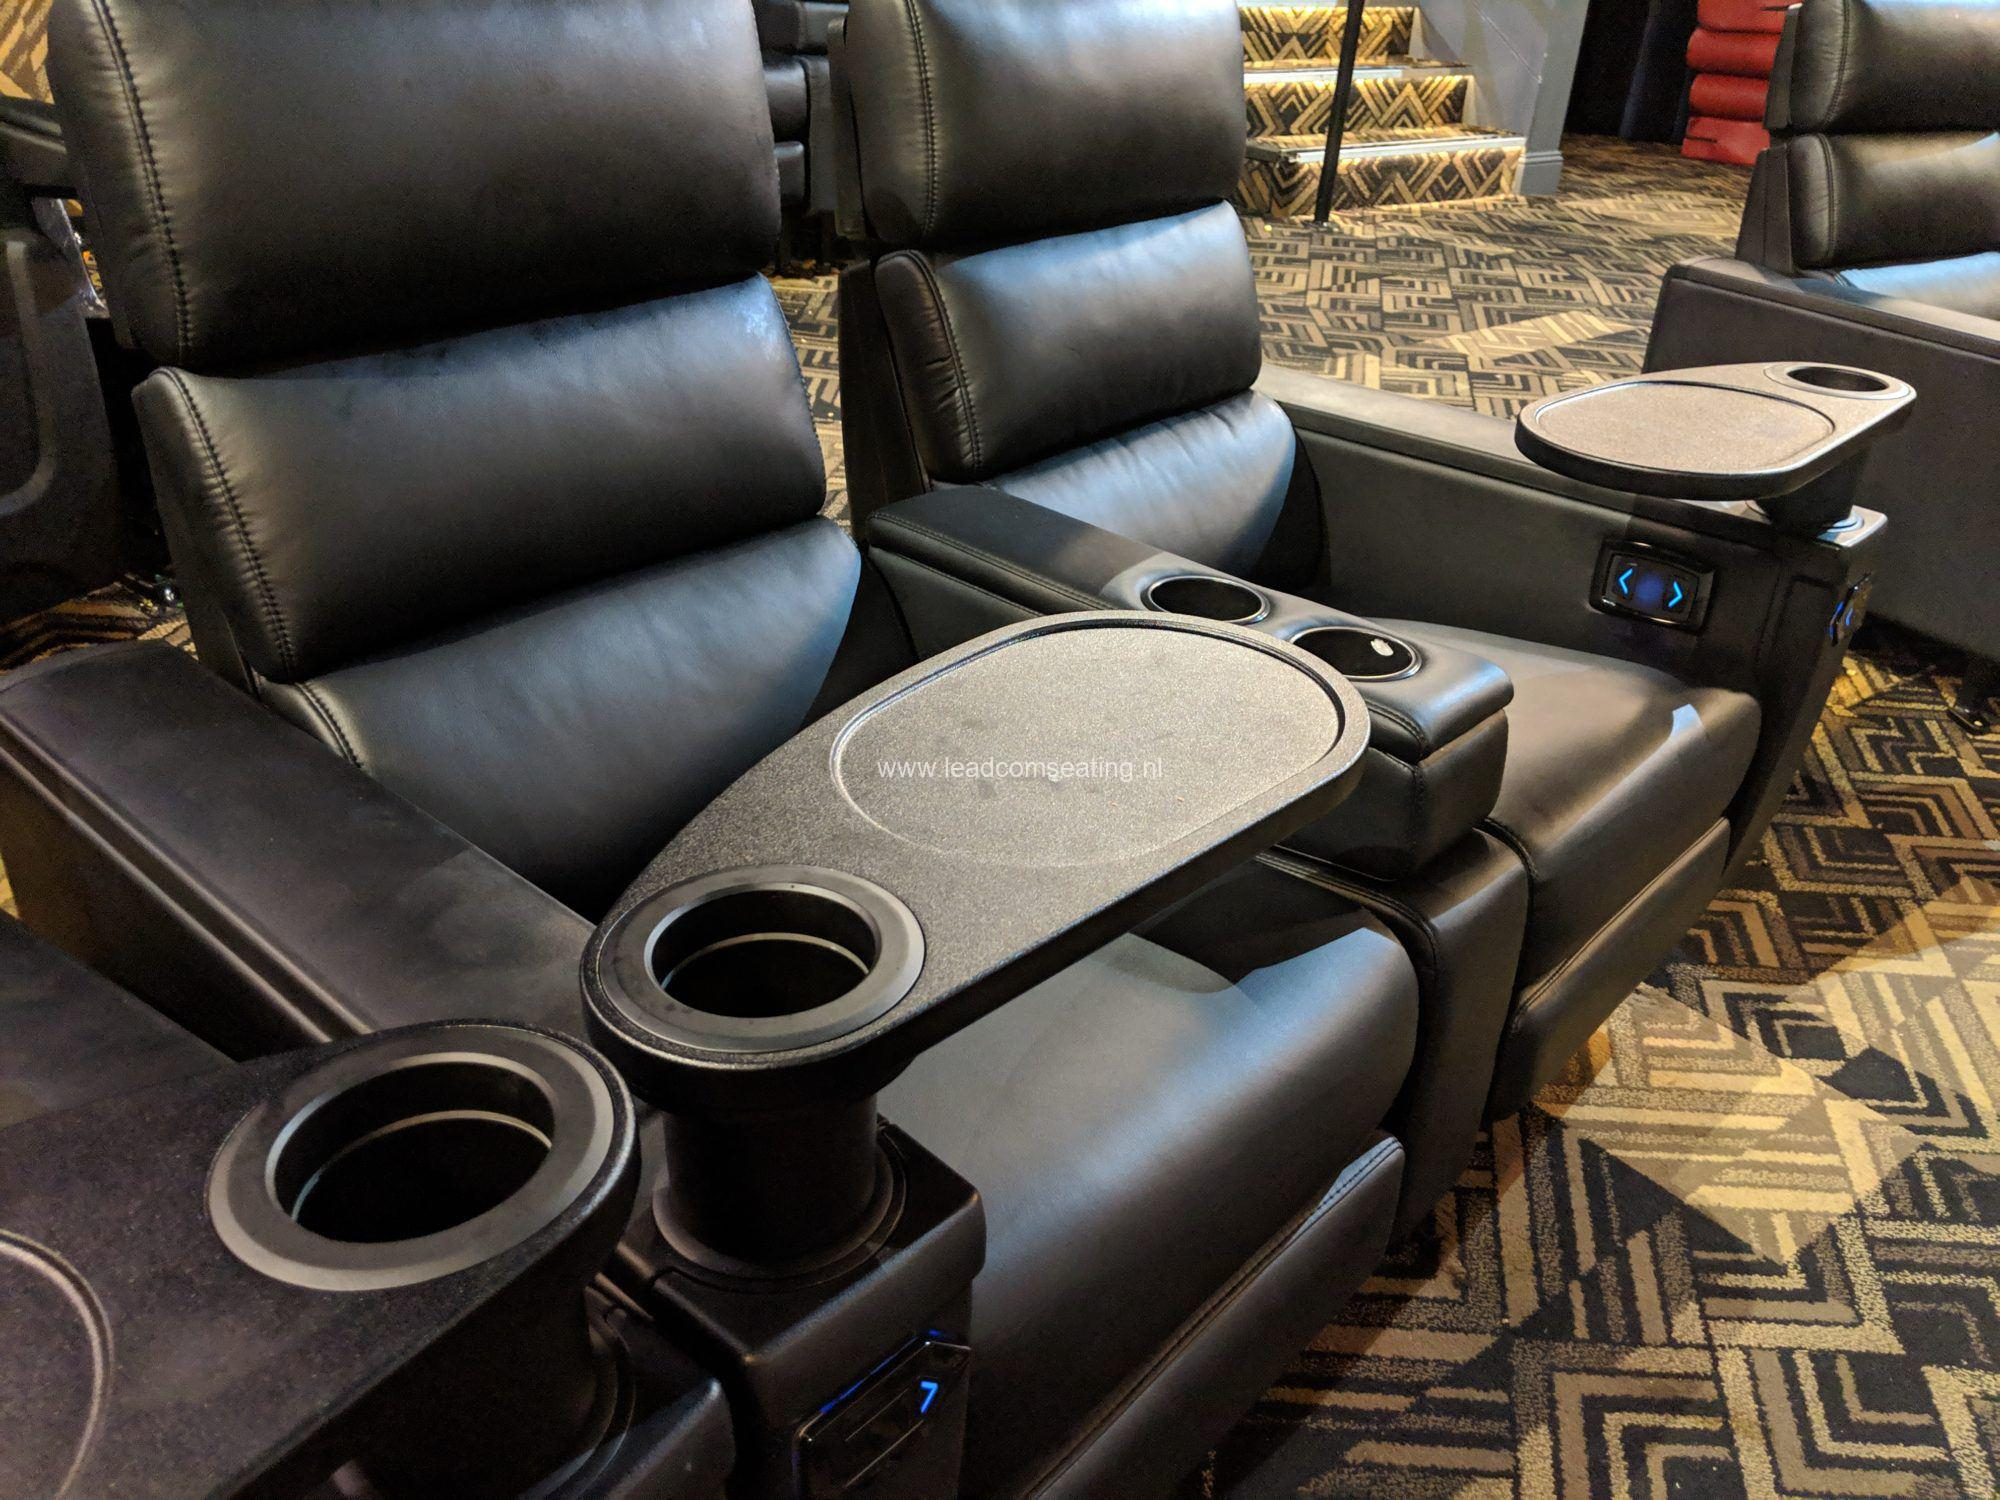 Redbank-cinema-new-wall-hugger-chair-1-2